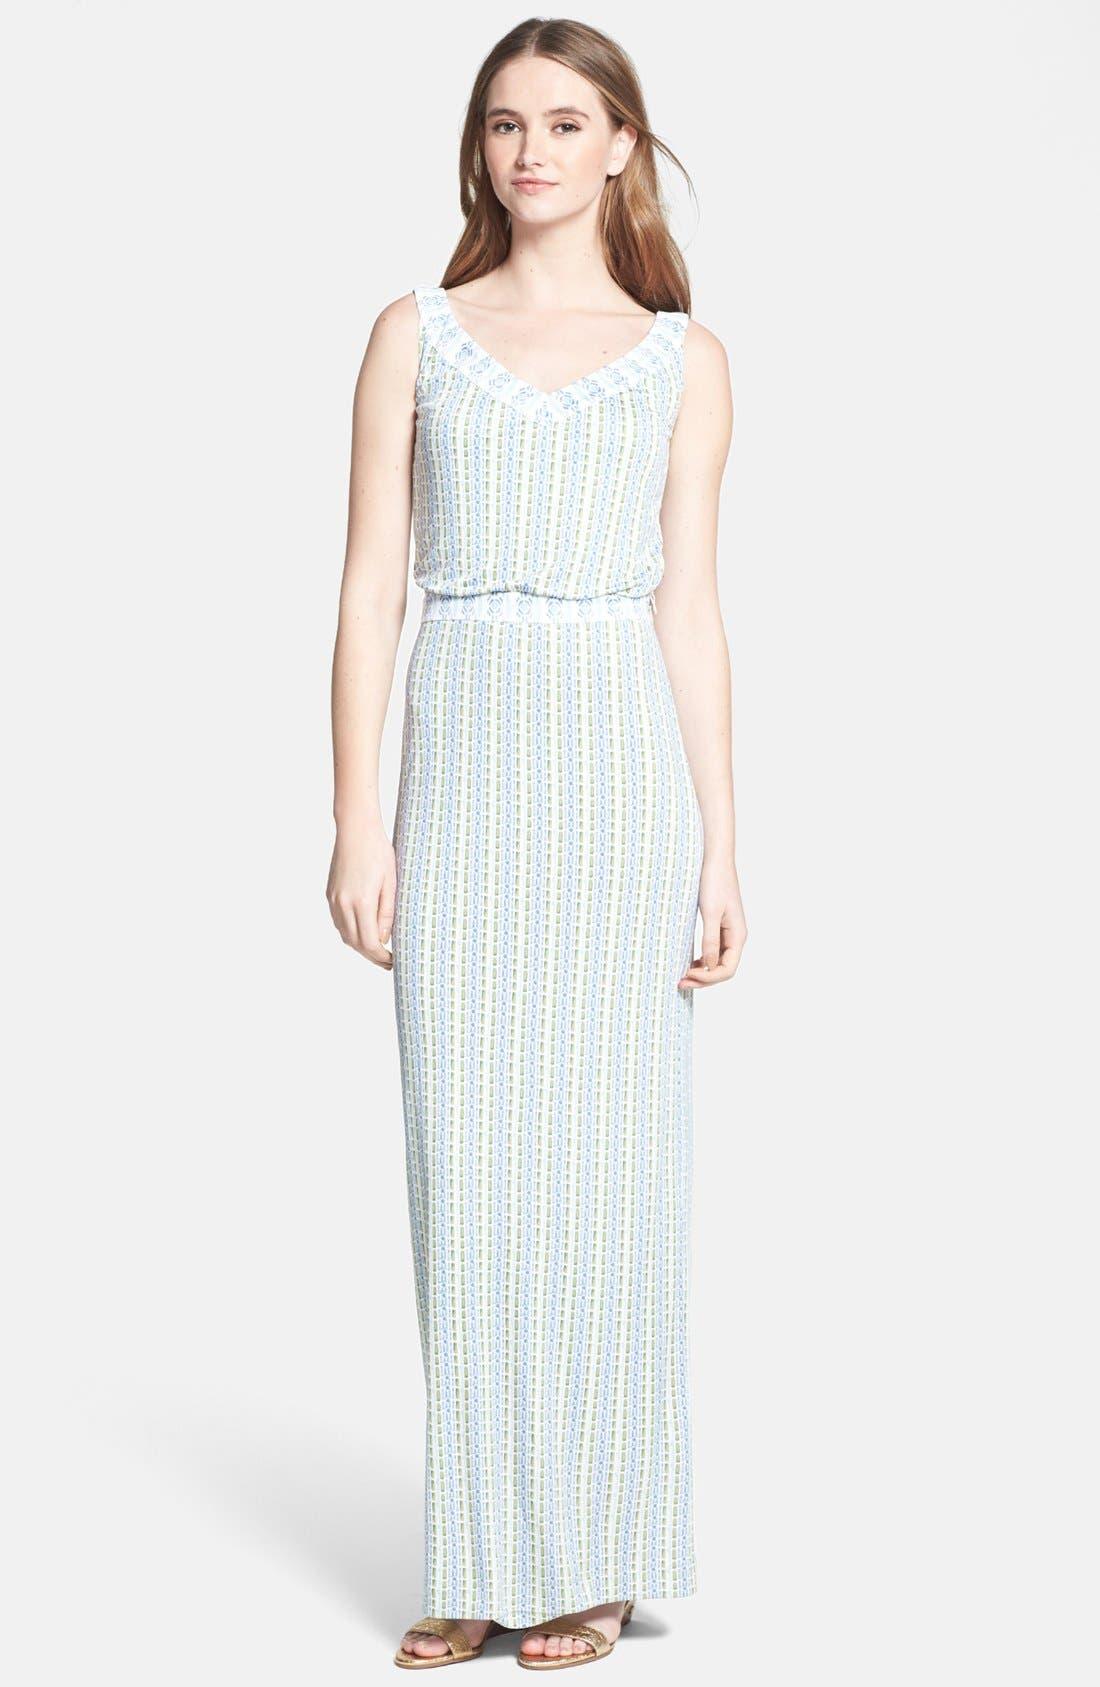 Main Image - Tory Burch 'Micky' Silk Blouson Maxi Dress